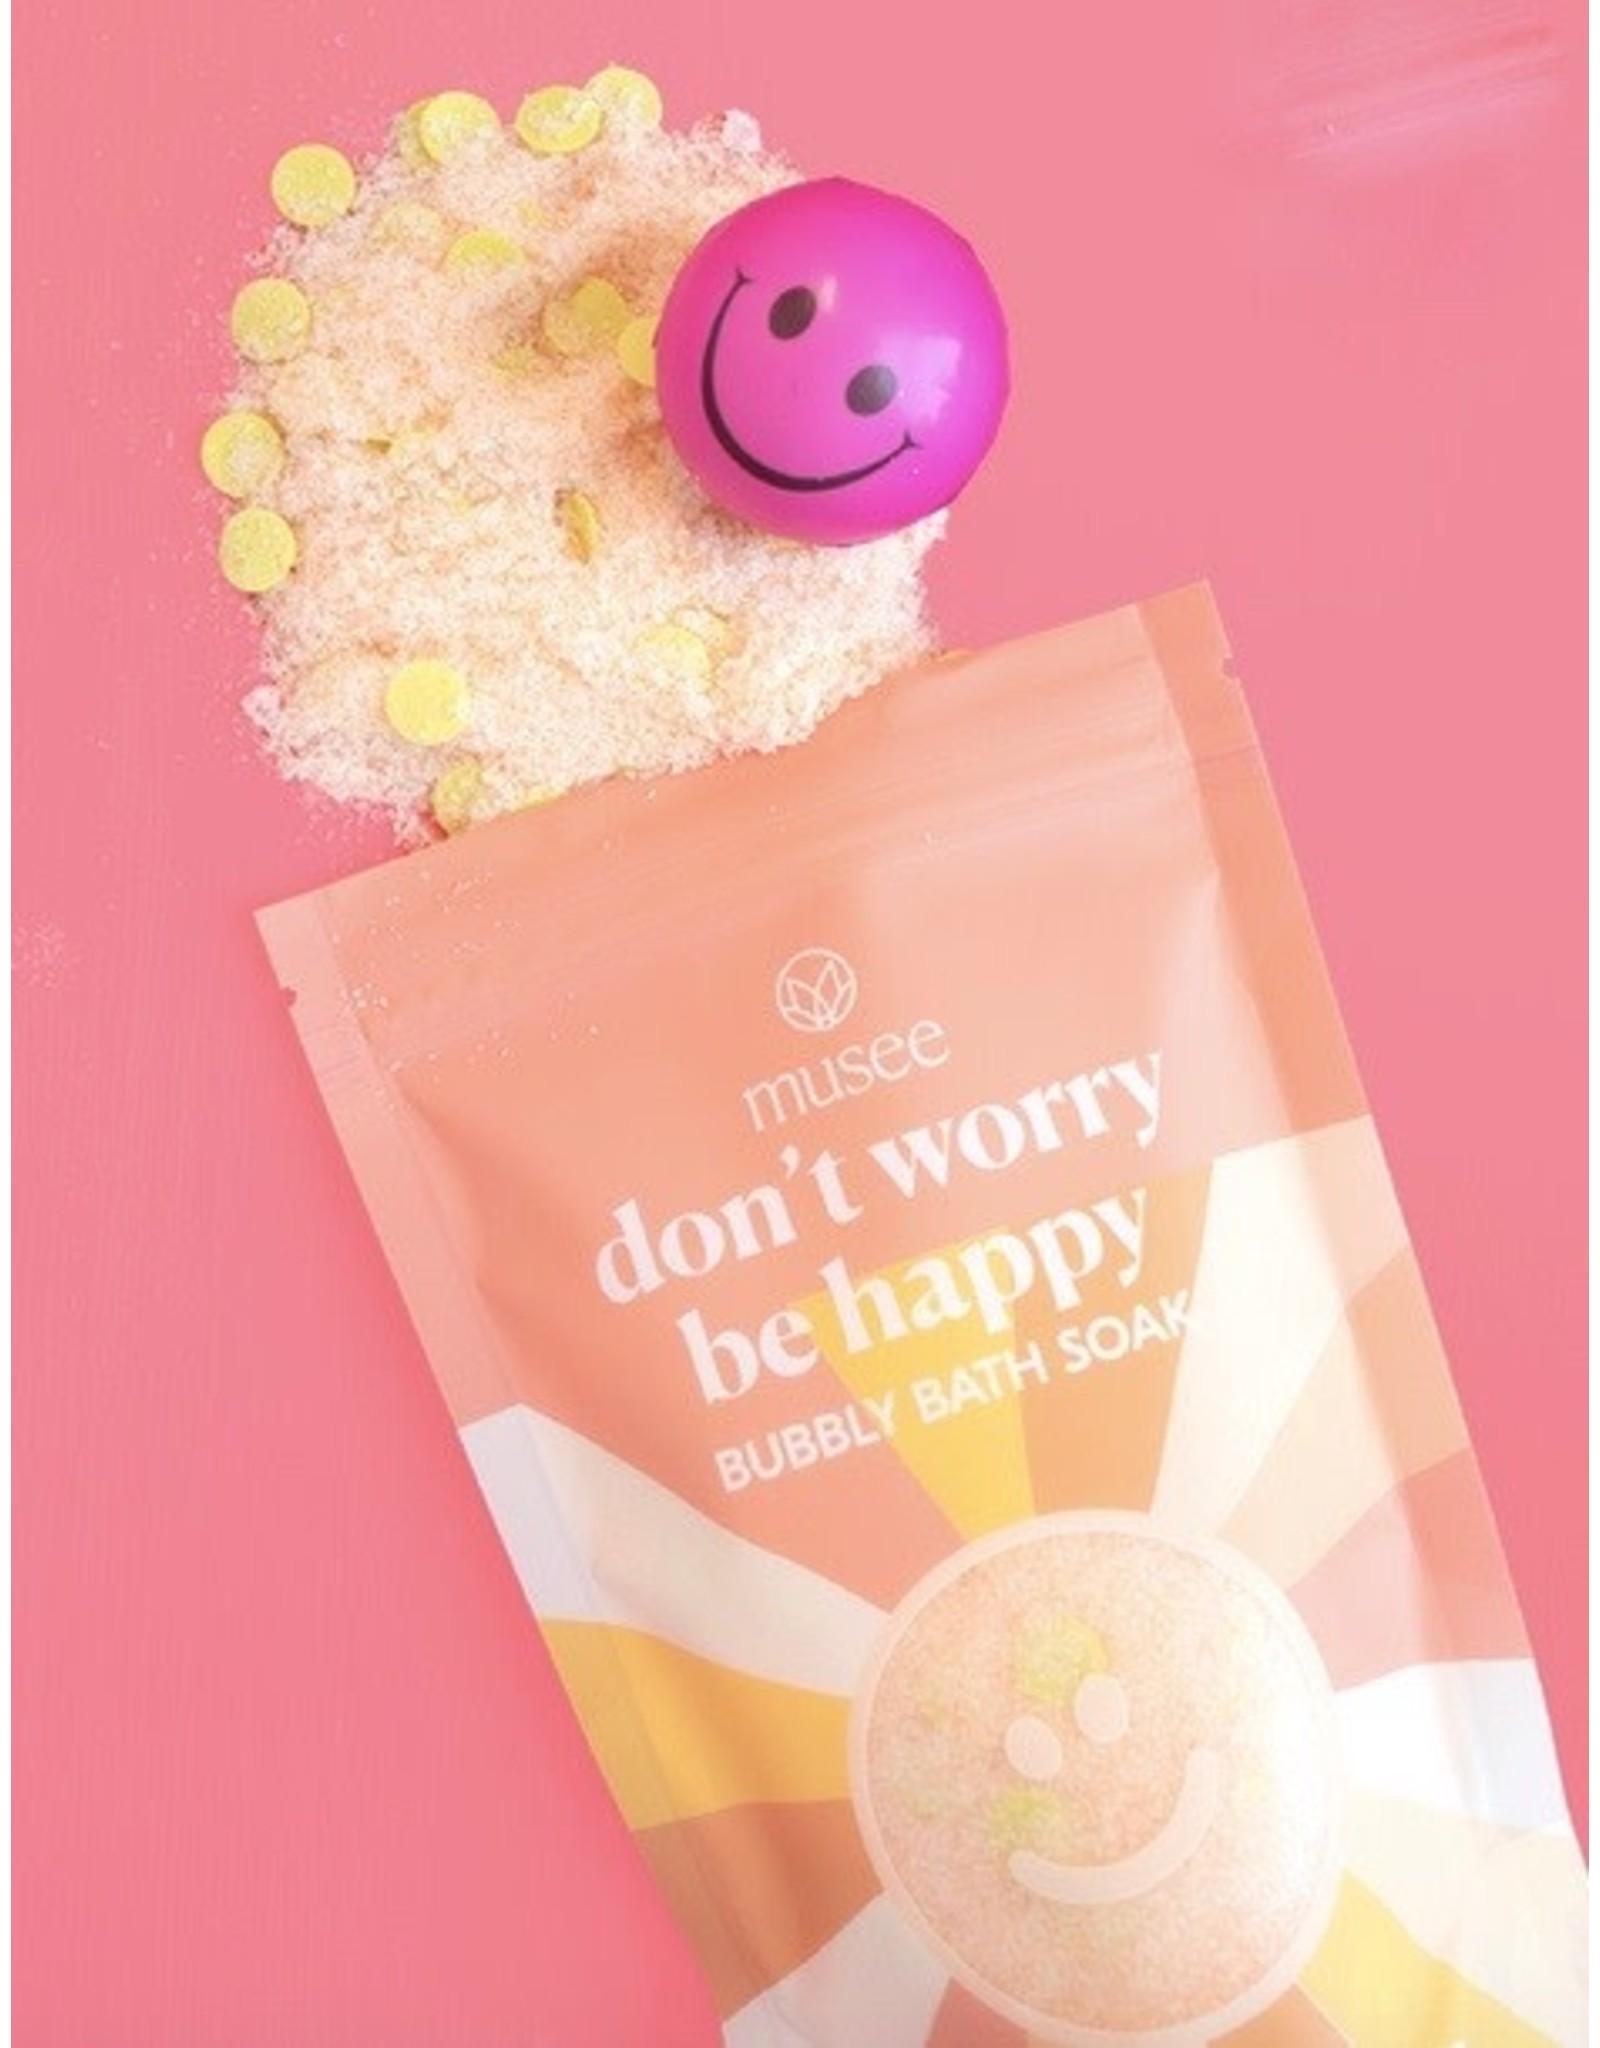 Don't Worry, Be Happy Salt